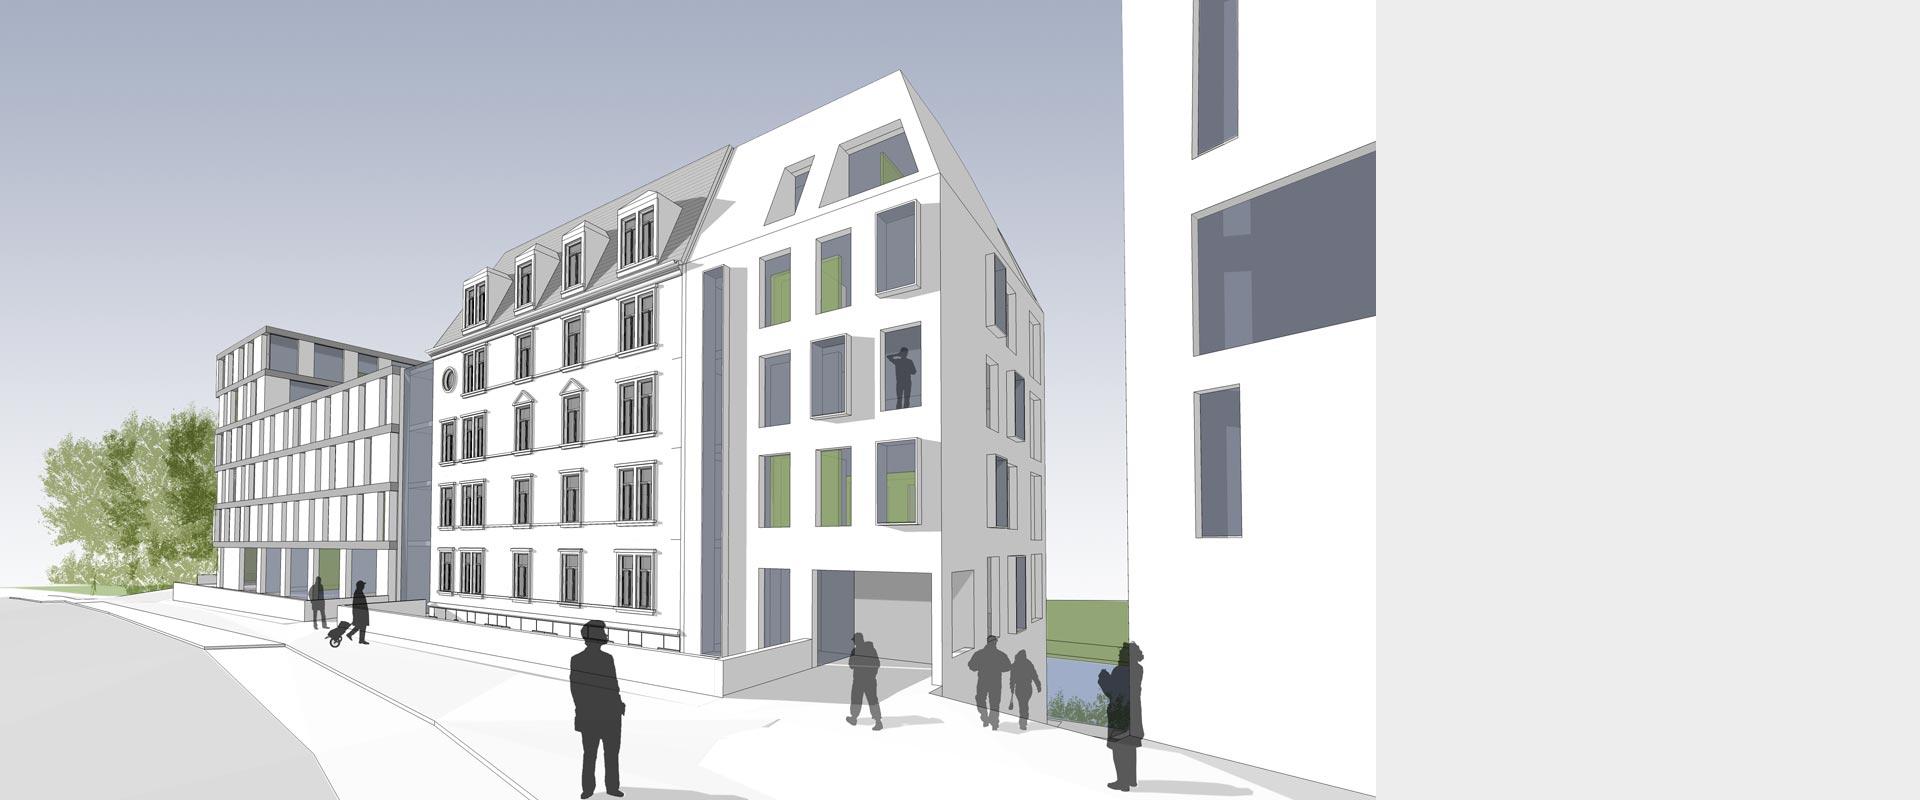 architekturbuero_henning_musahl_waldshut_stadtschloss_05